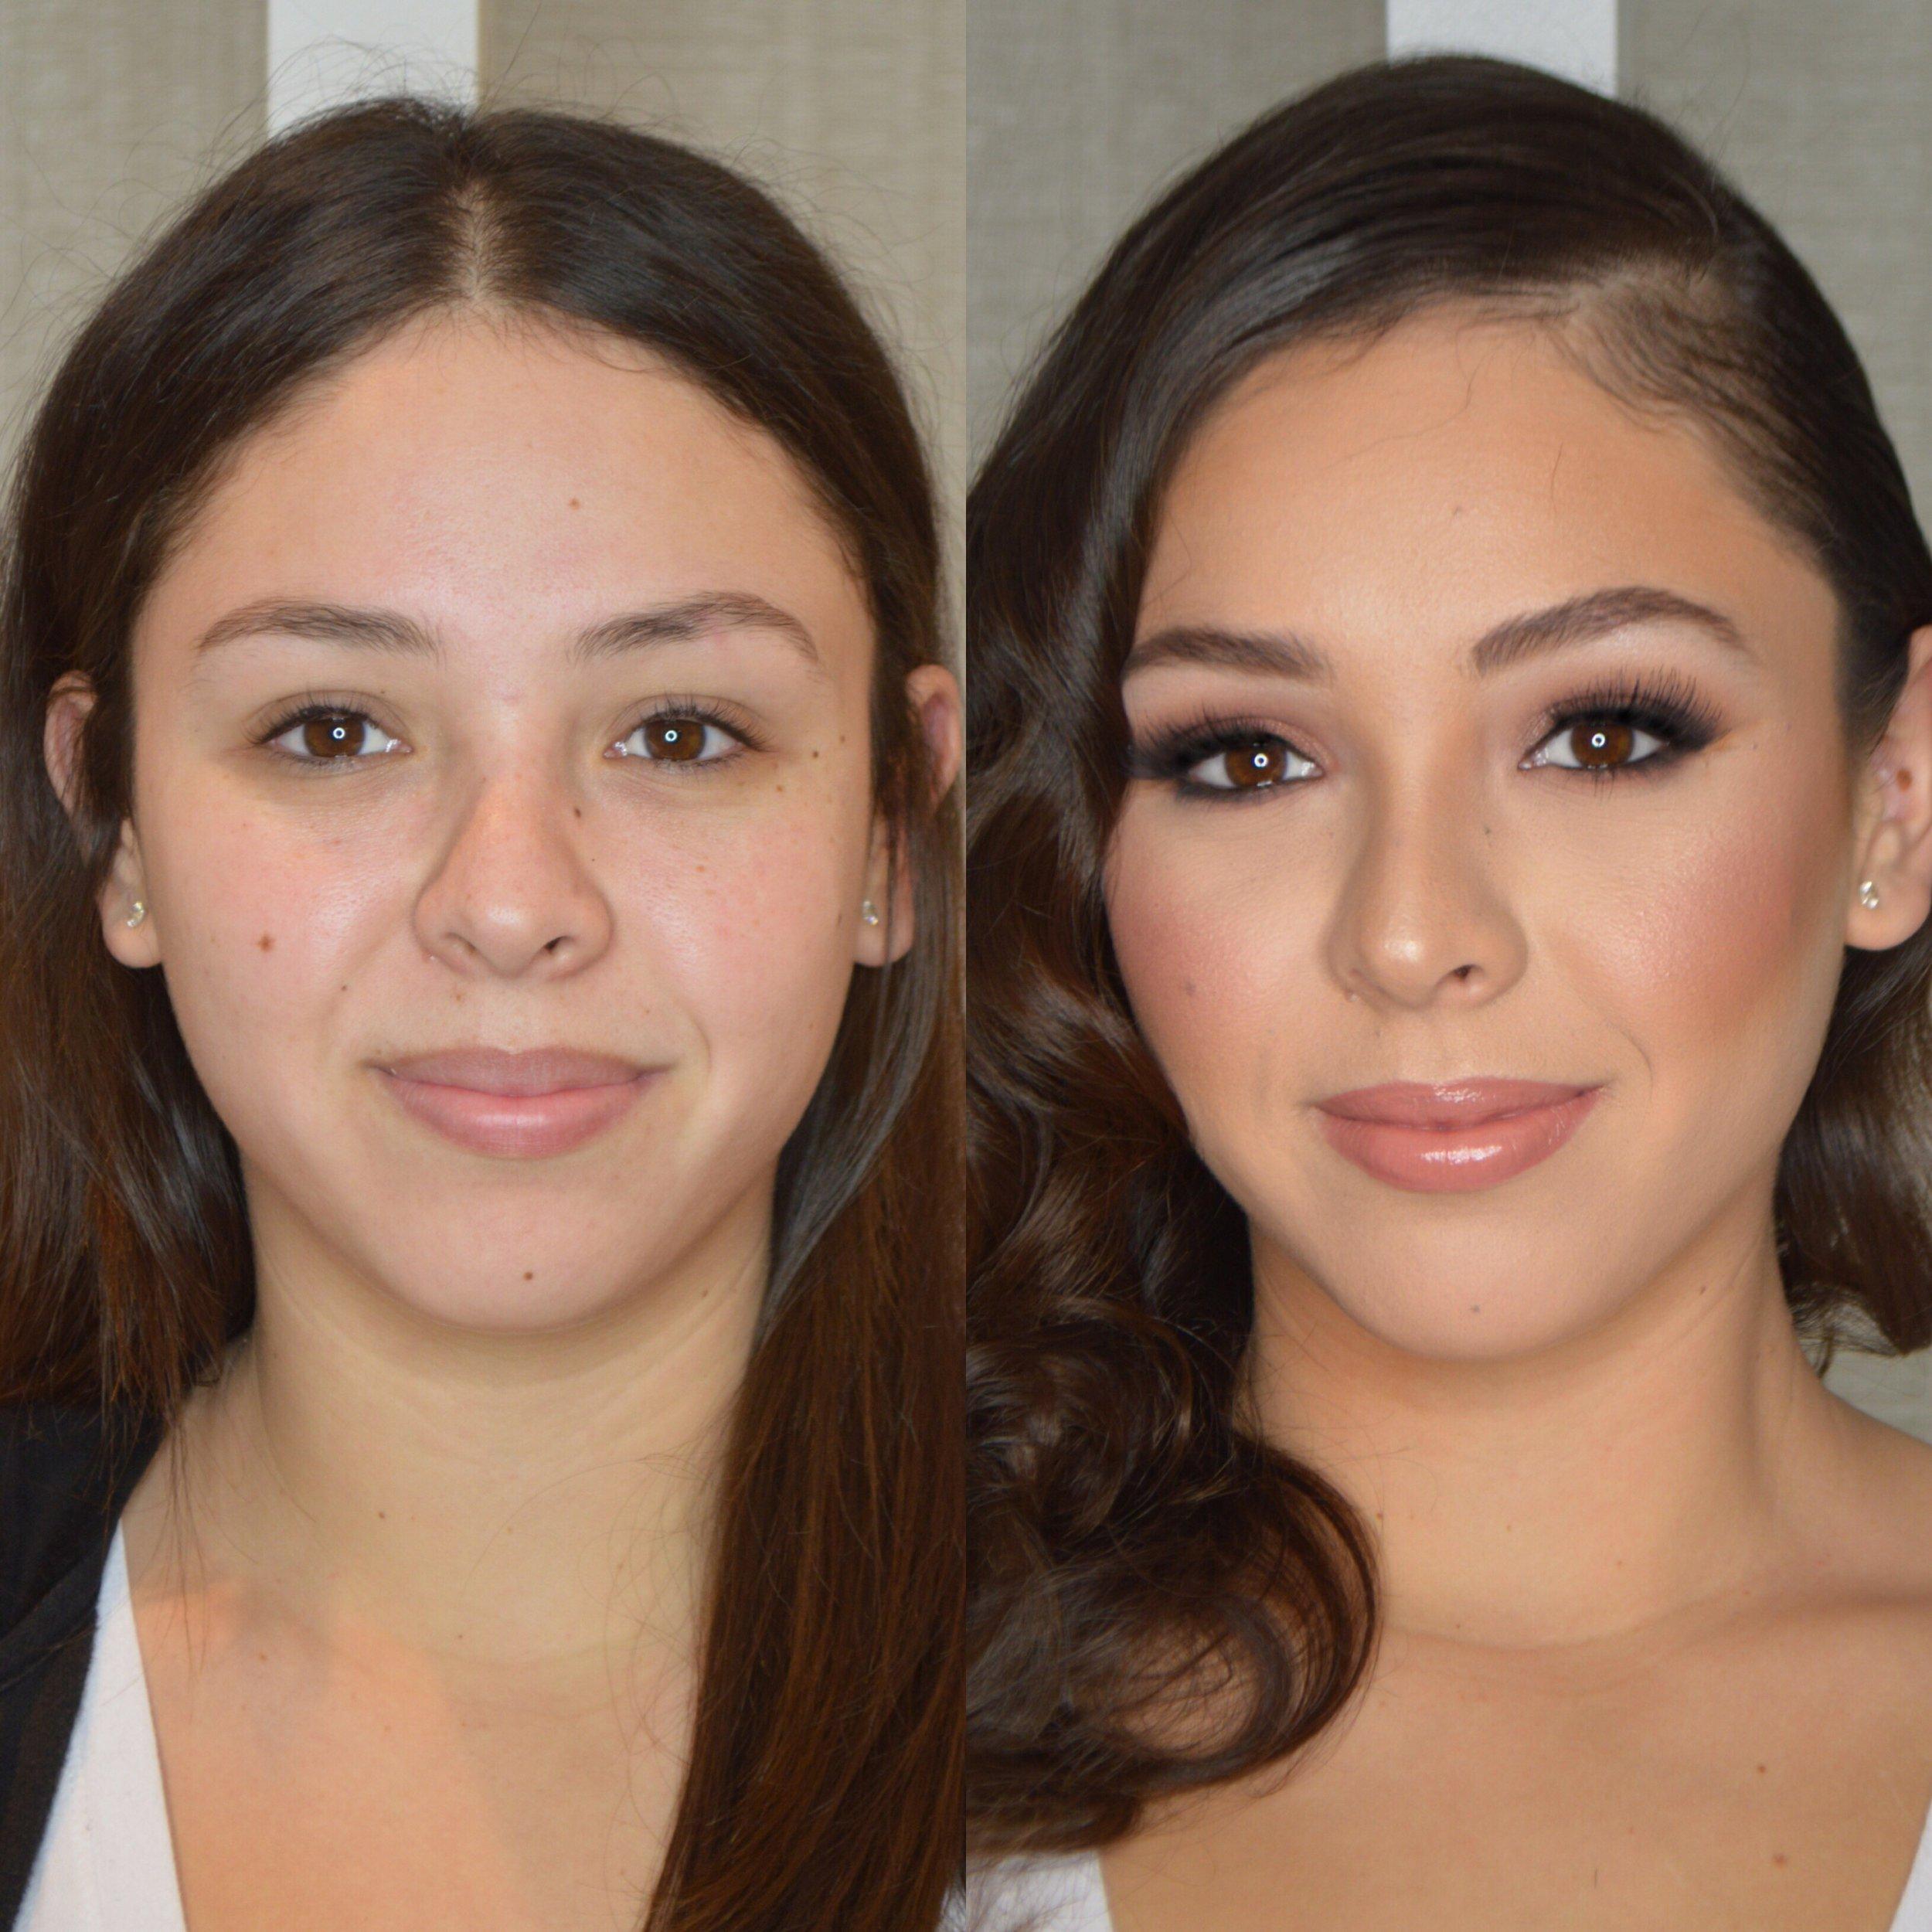 Patricia_Castro_Makeup_Los_Angeles_Makeup_Artist_39.jpg